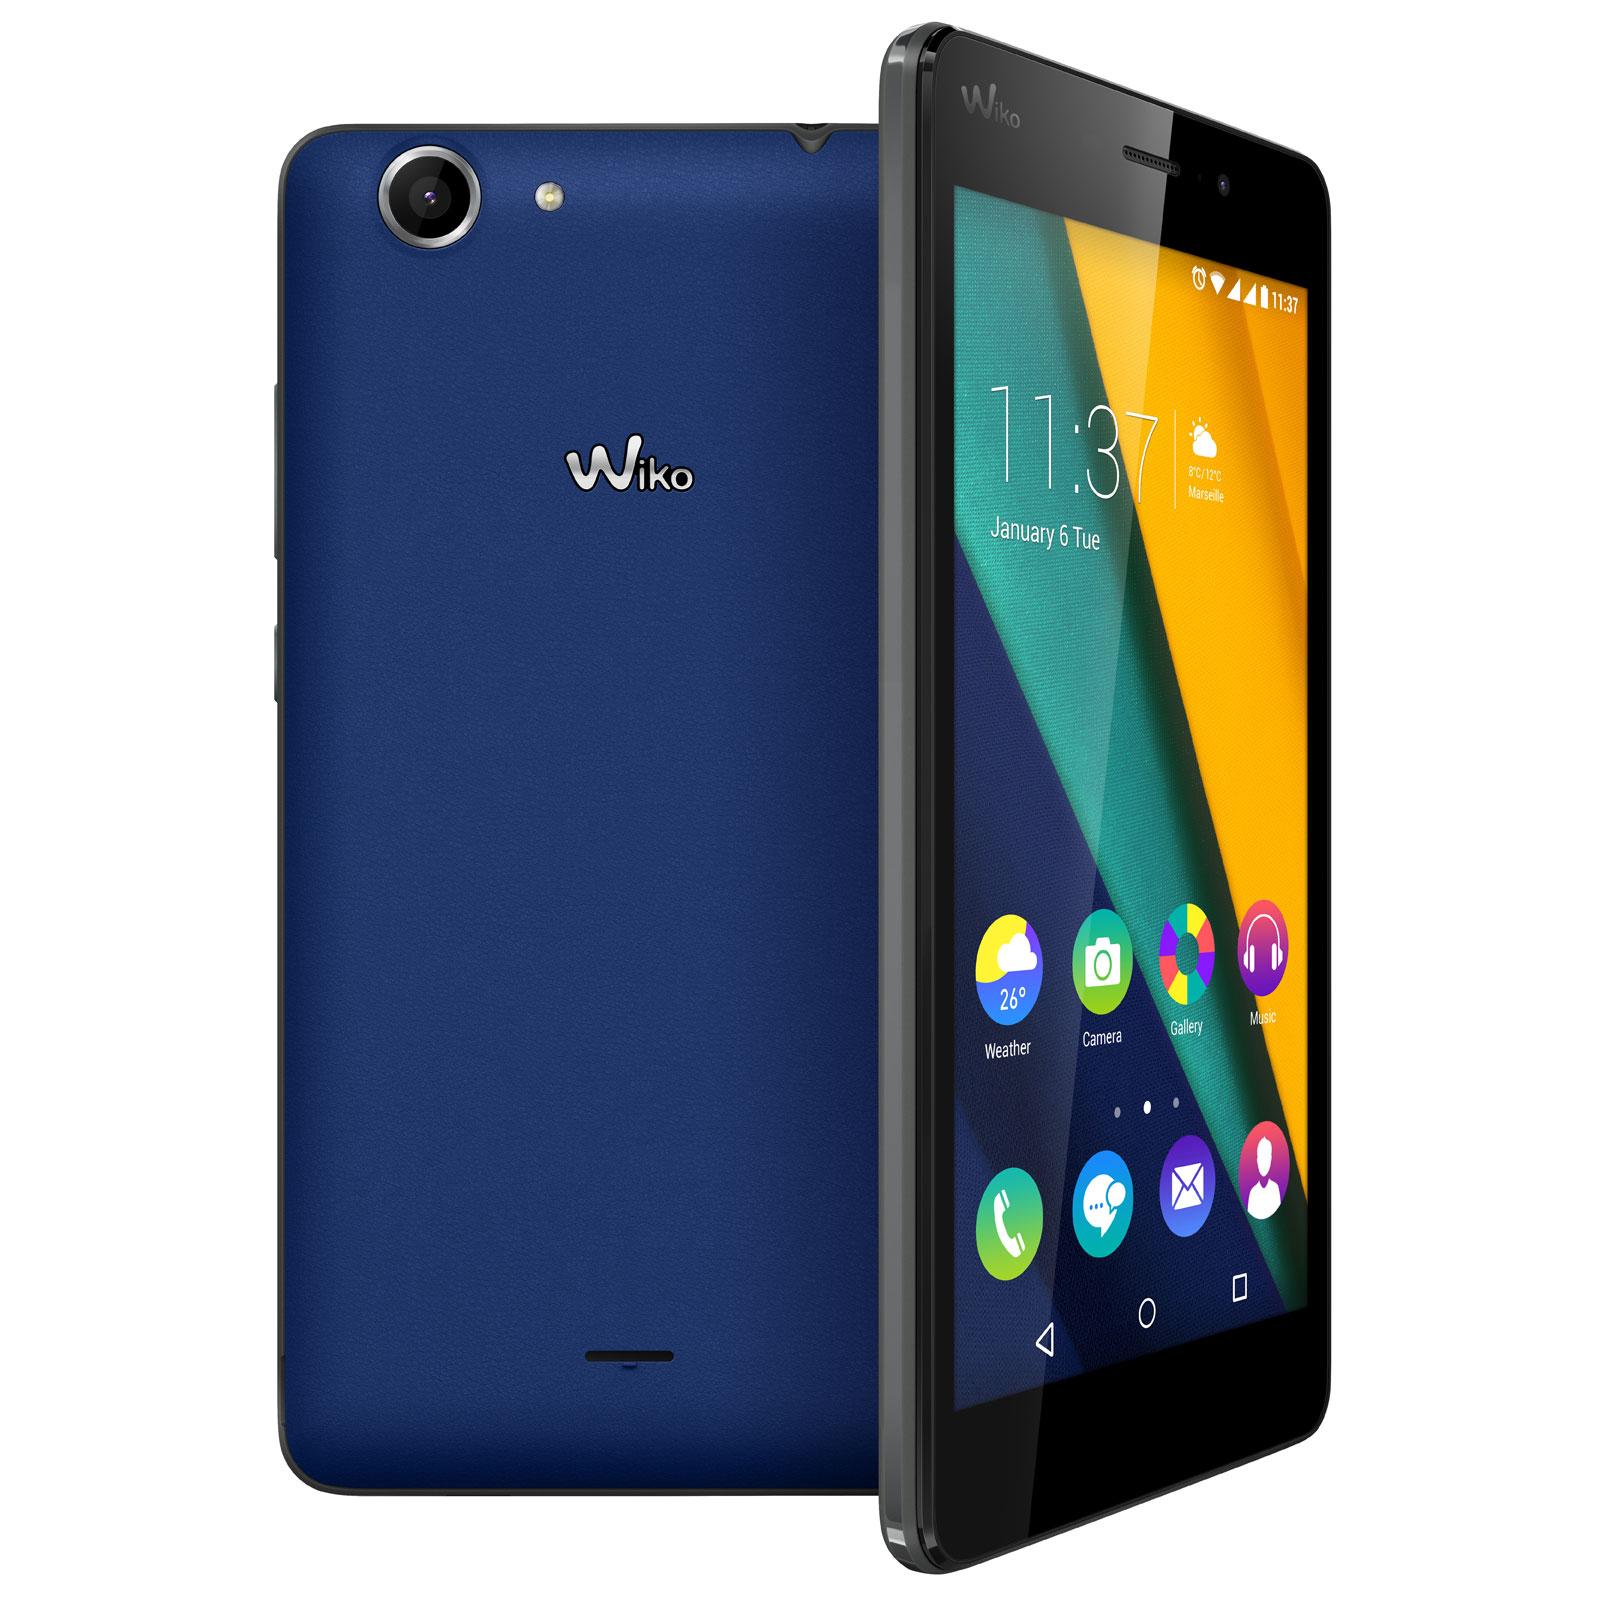 Wiko pulp fab 4g bleu mobile smartphone wiko sur ldlc for Photo ecran wiko